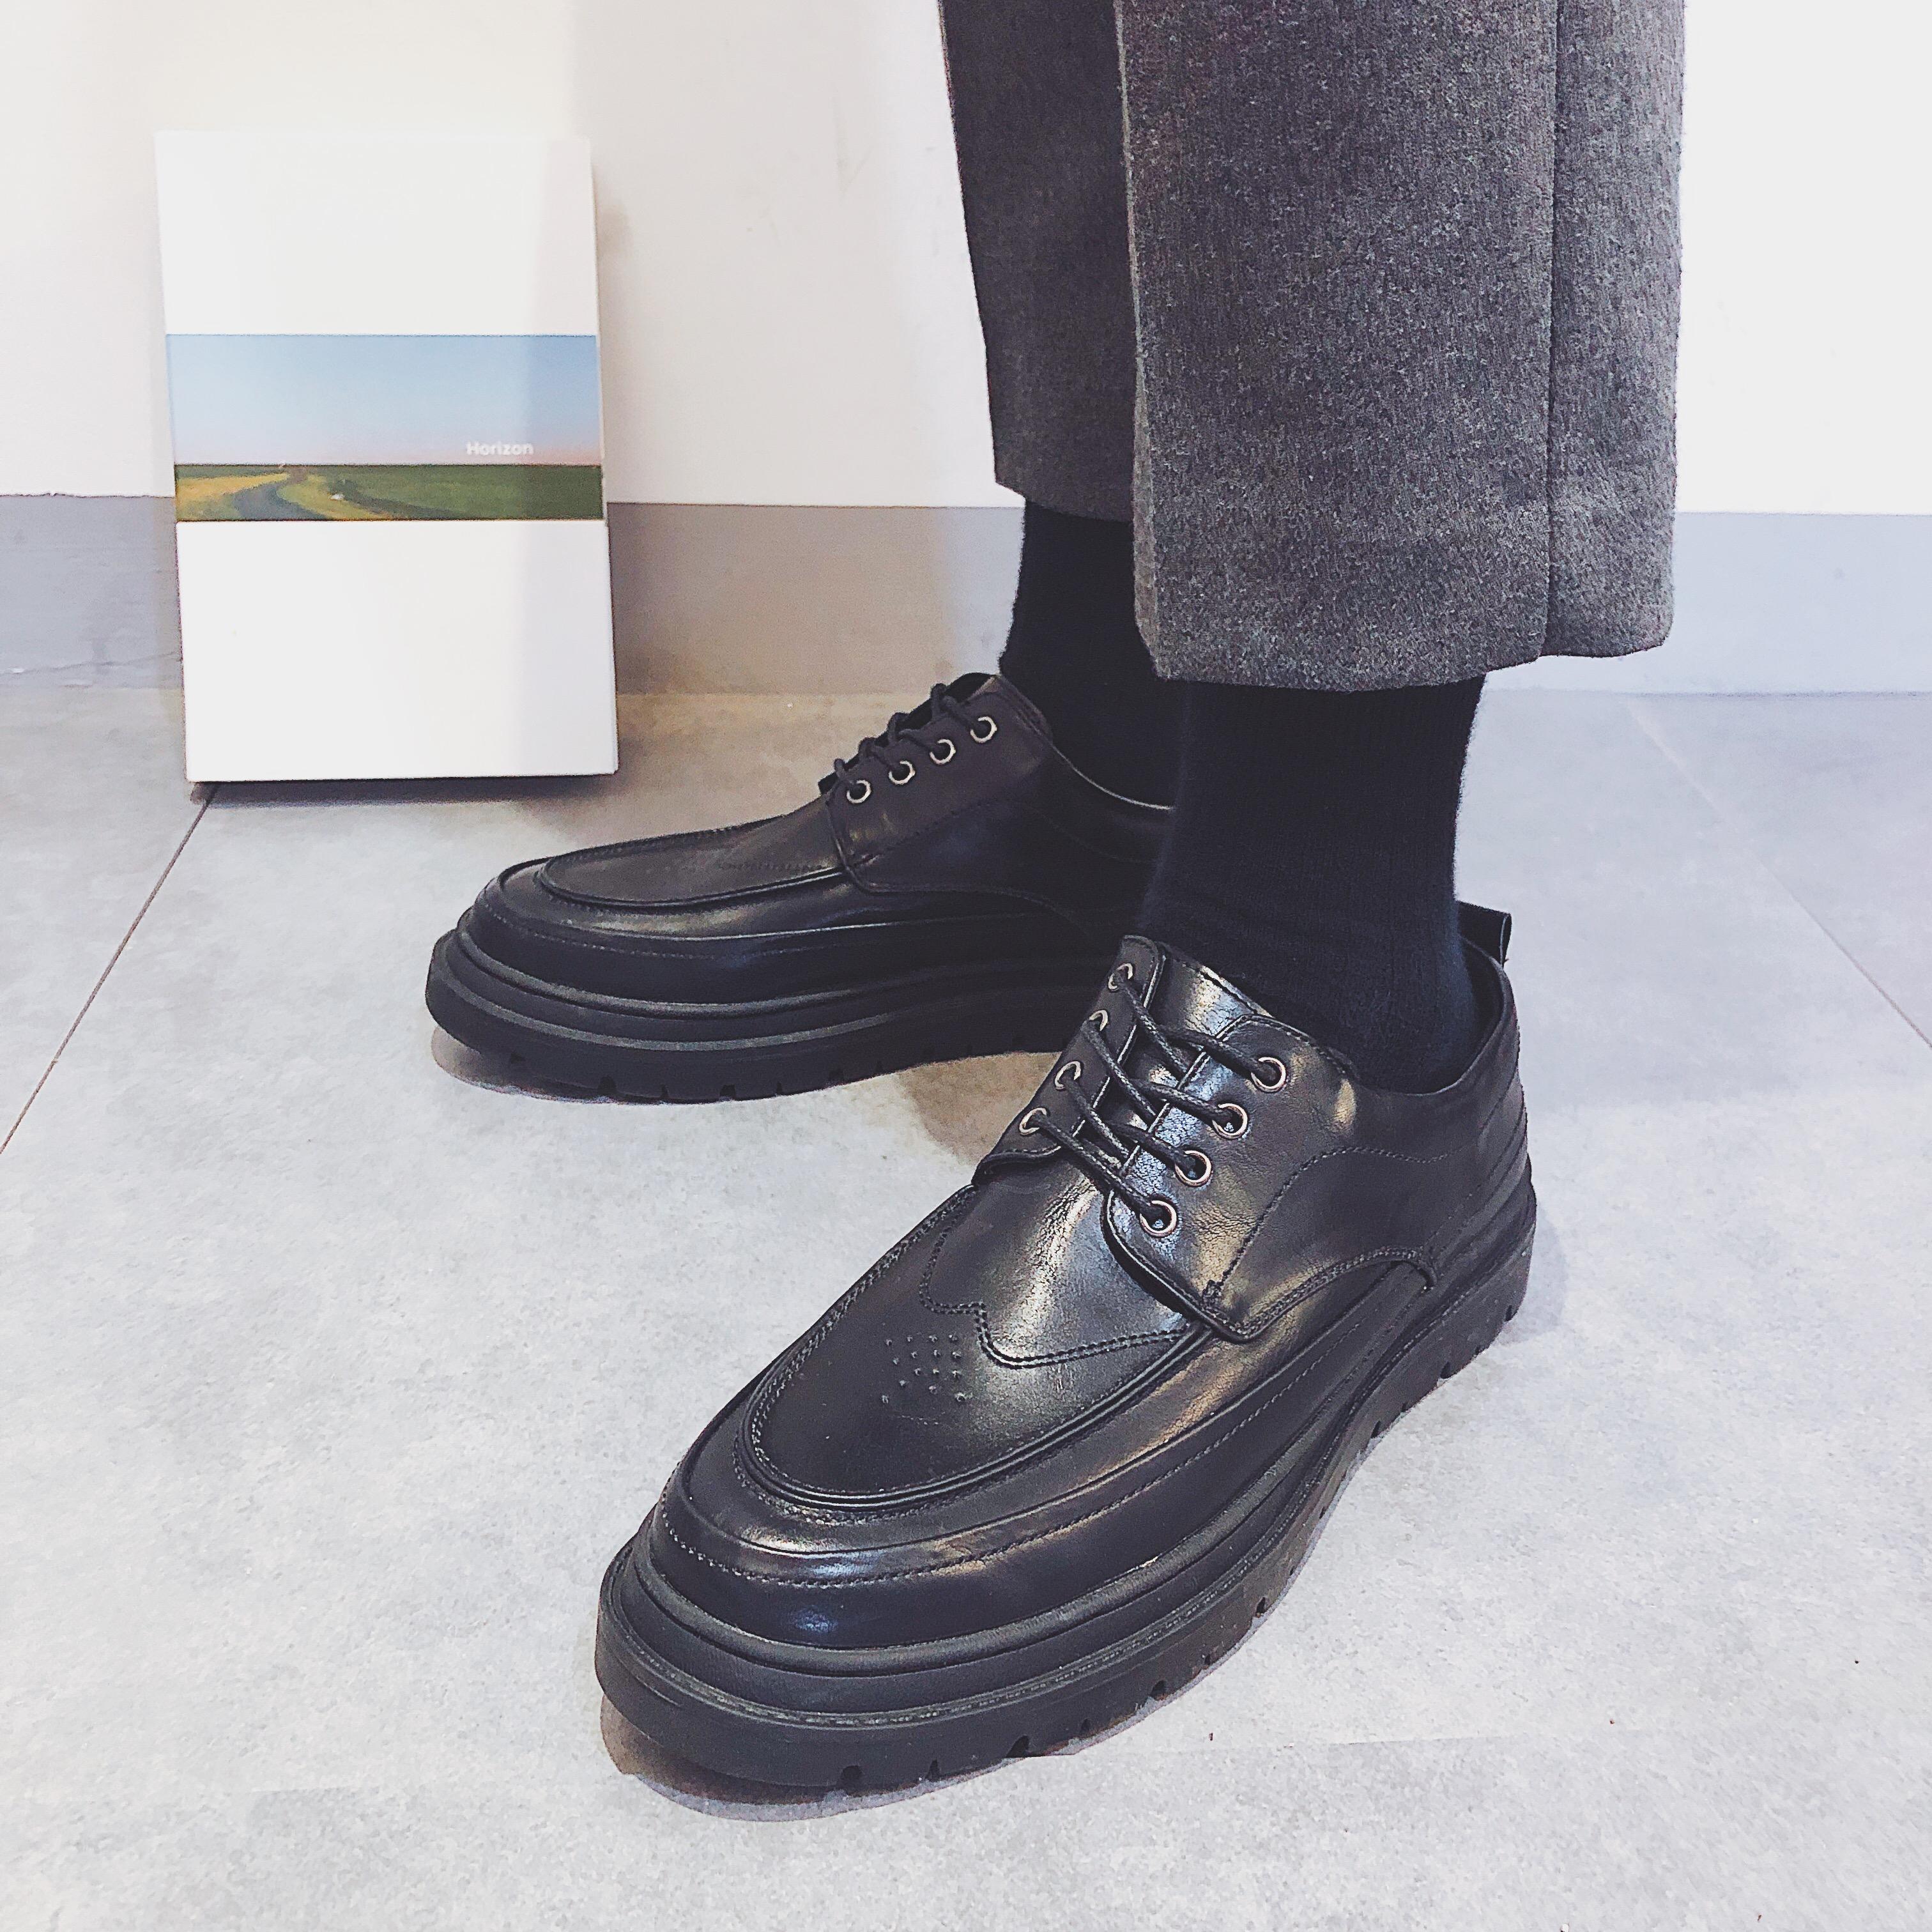 Мужские туфли / Полуботинки Артикул 597014240717